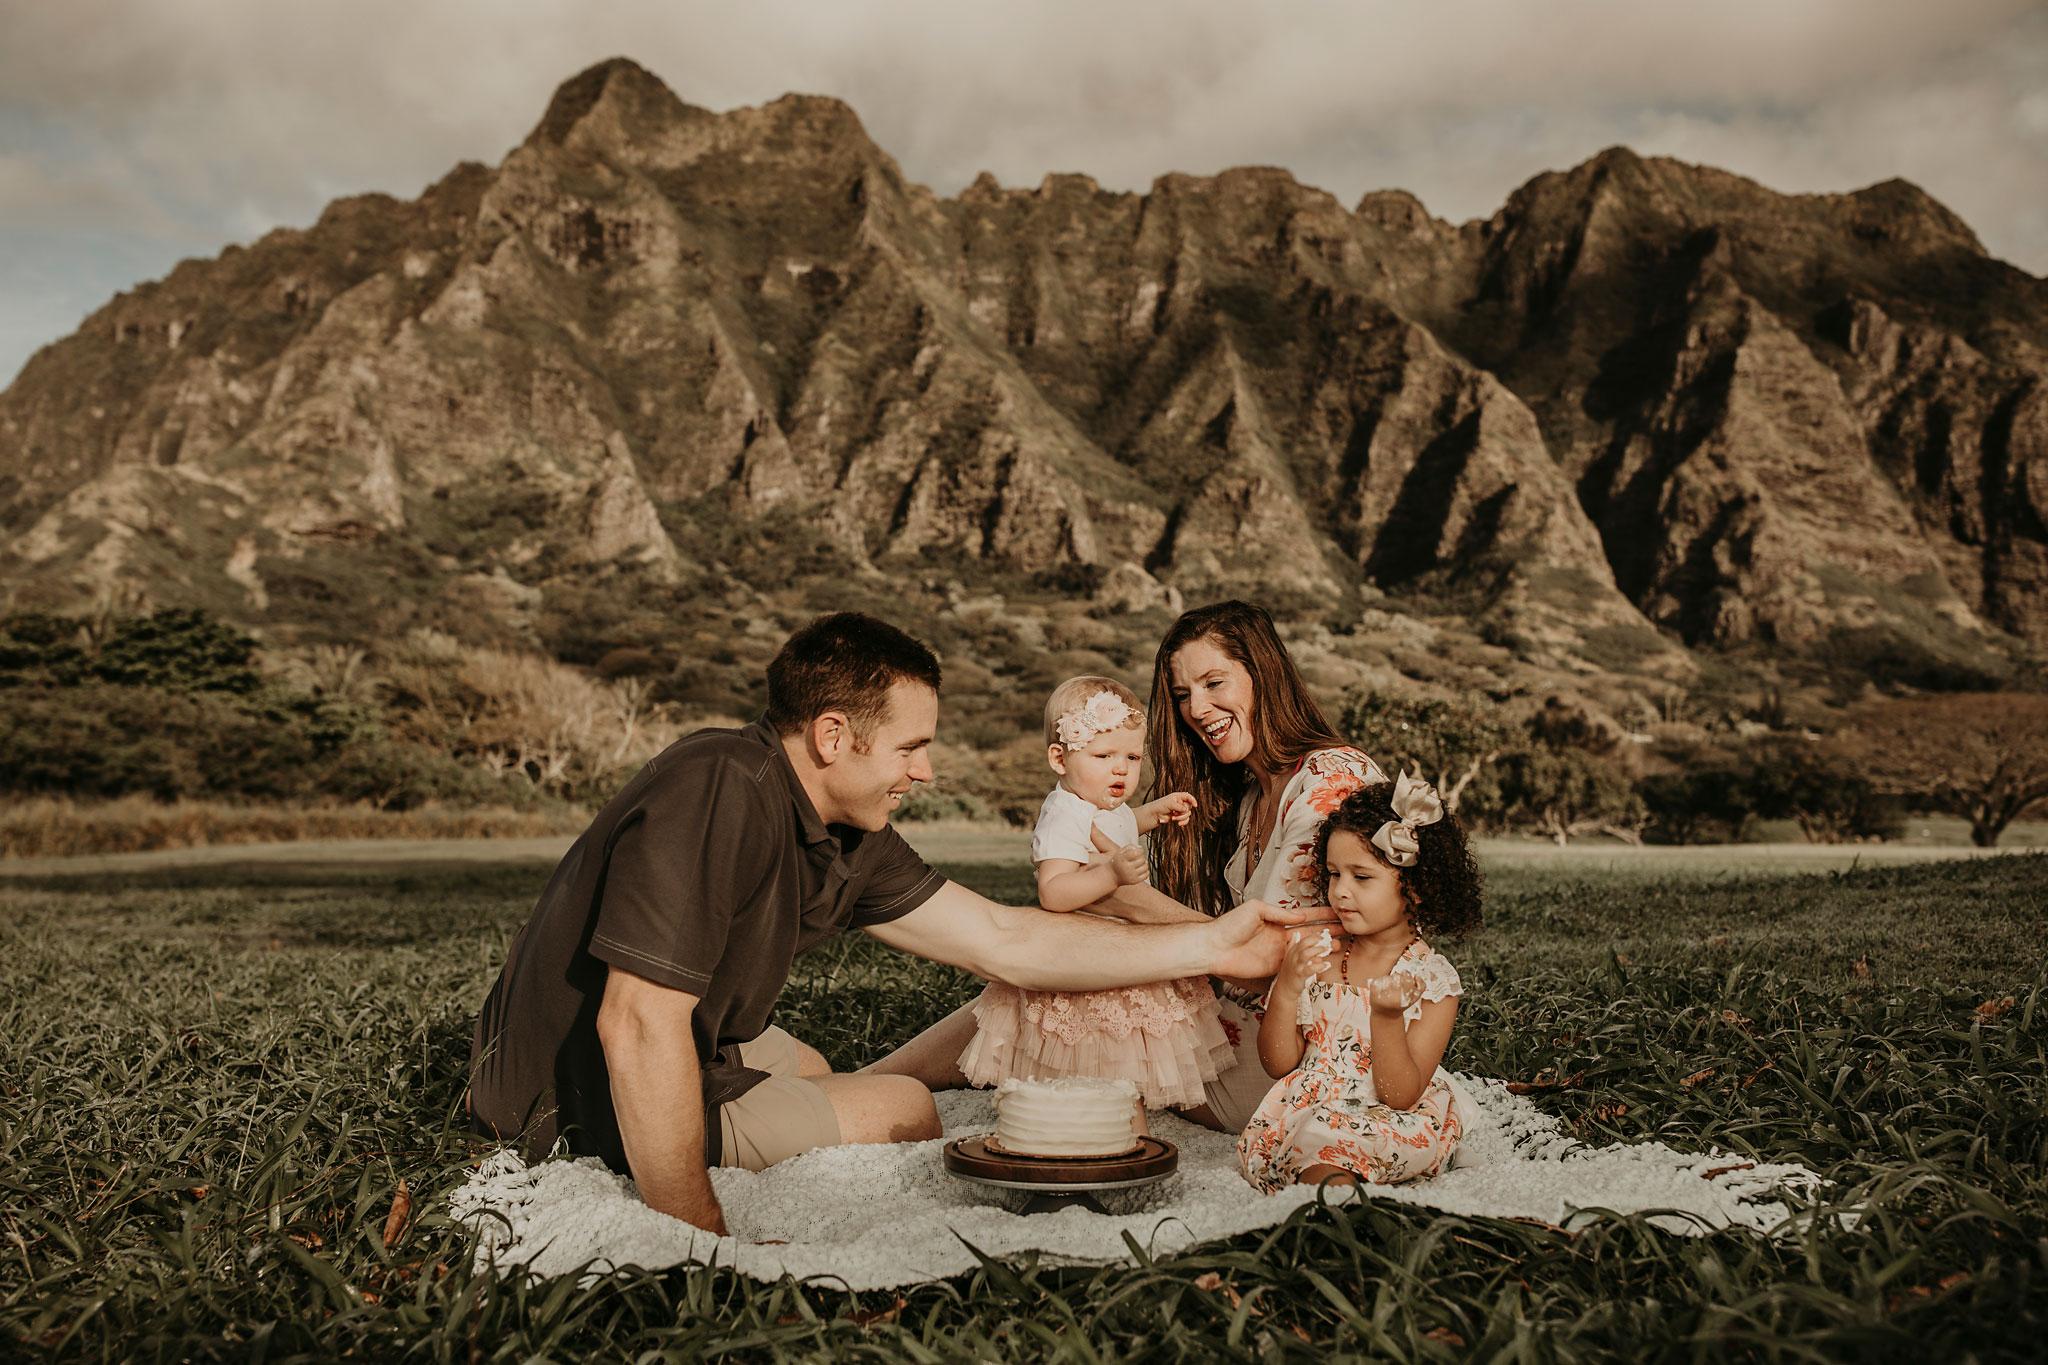 Sunrise-family-shoot-kualoa-ranch-32.jpg